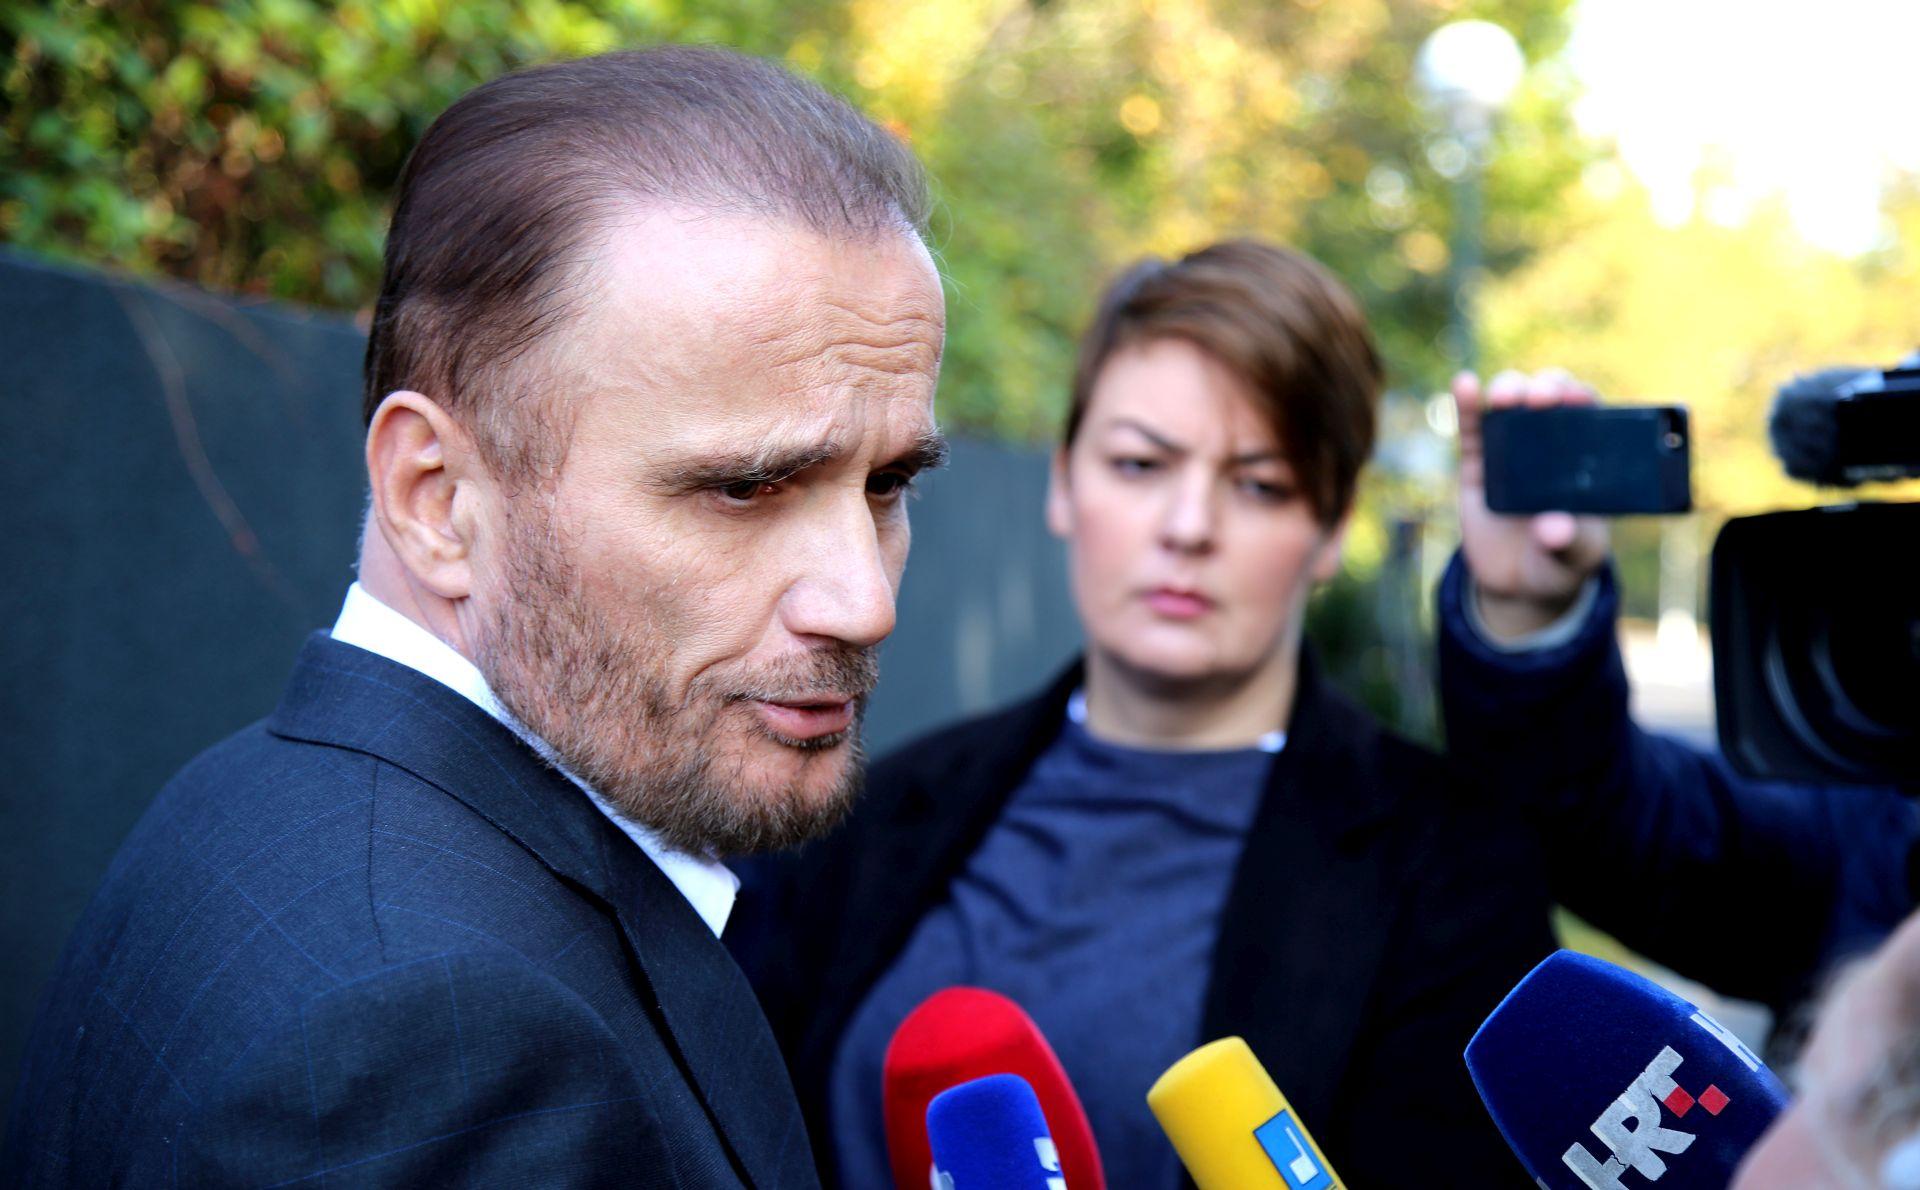 PIRUŠKIN ODVJETNIK IMA PLAN Anto Nobilo: Ministar Zdravko Marić je naš krunski svjedok